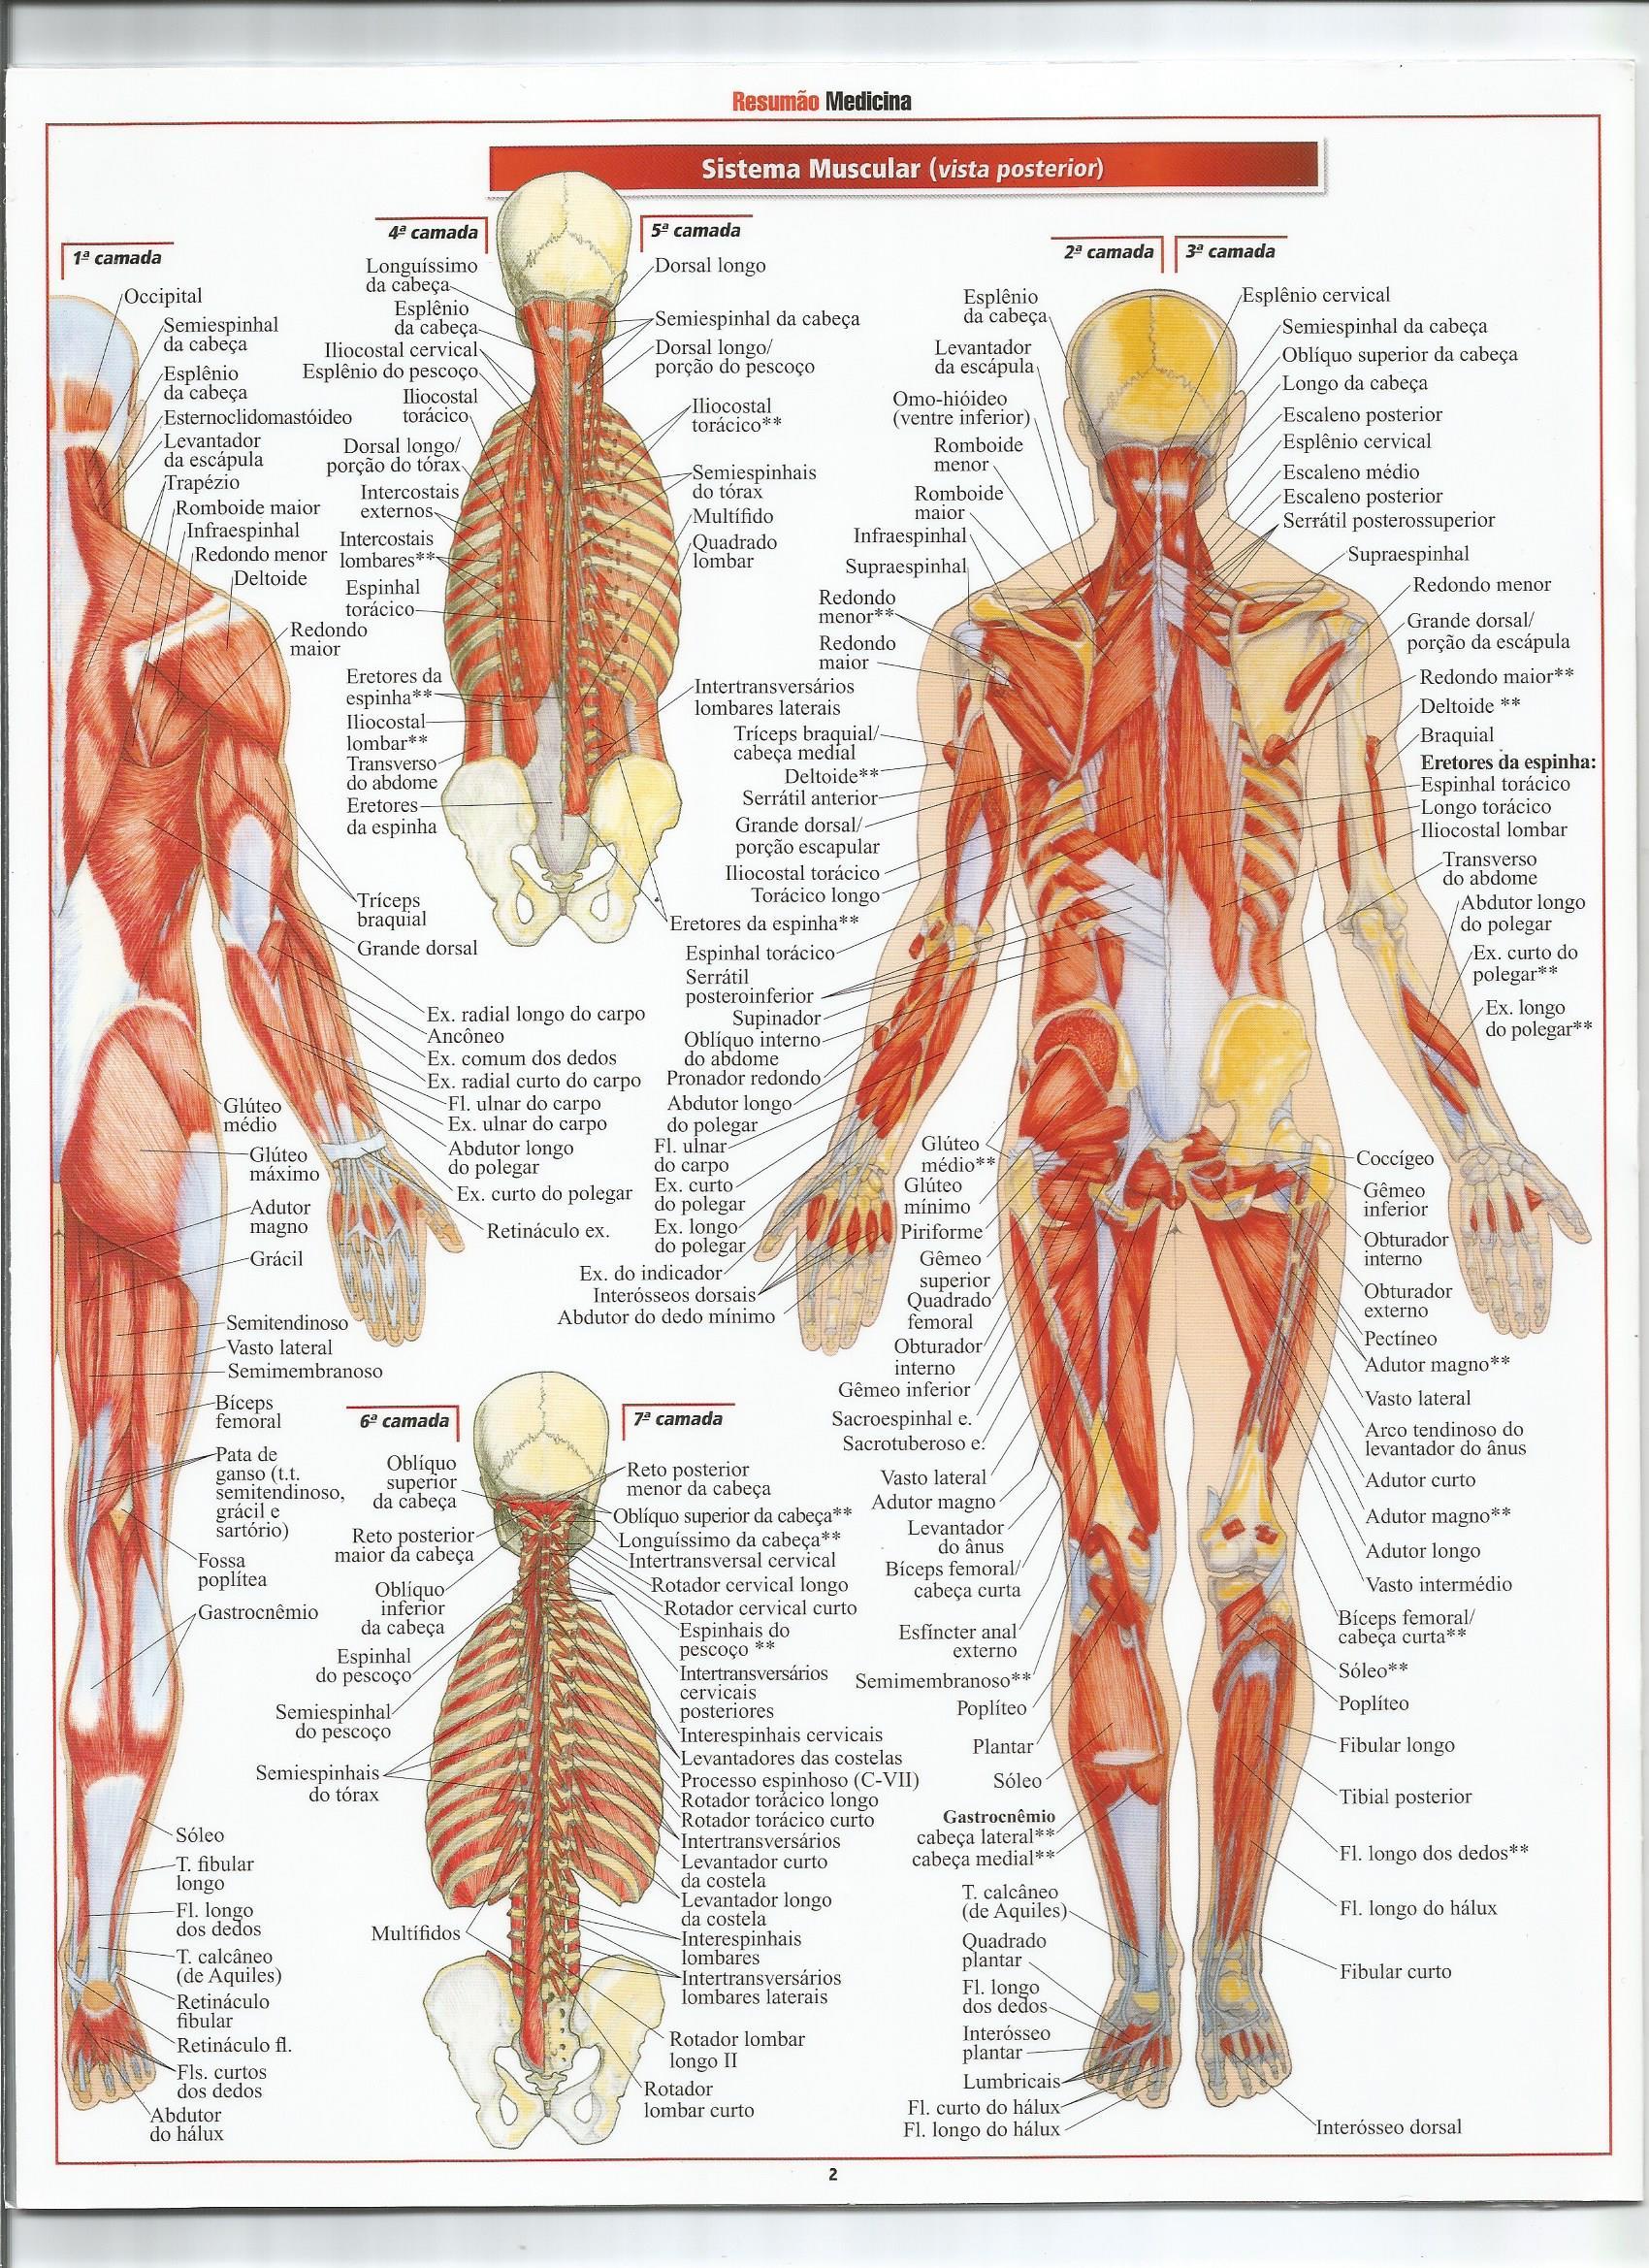 Resumão medicina - Sistema Muscular 02 - Anatomia Humana Sistê